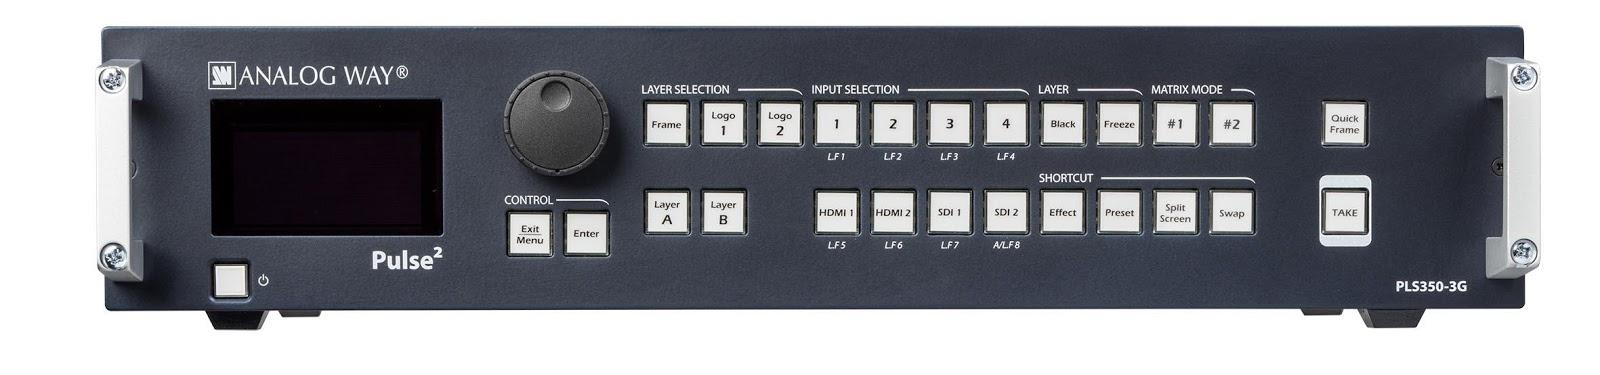 Analog Way PLS350-H Seamless HDBaseT Switcher/Mixer